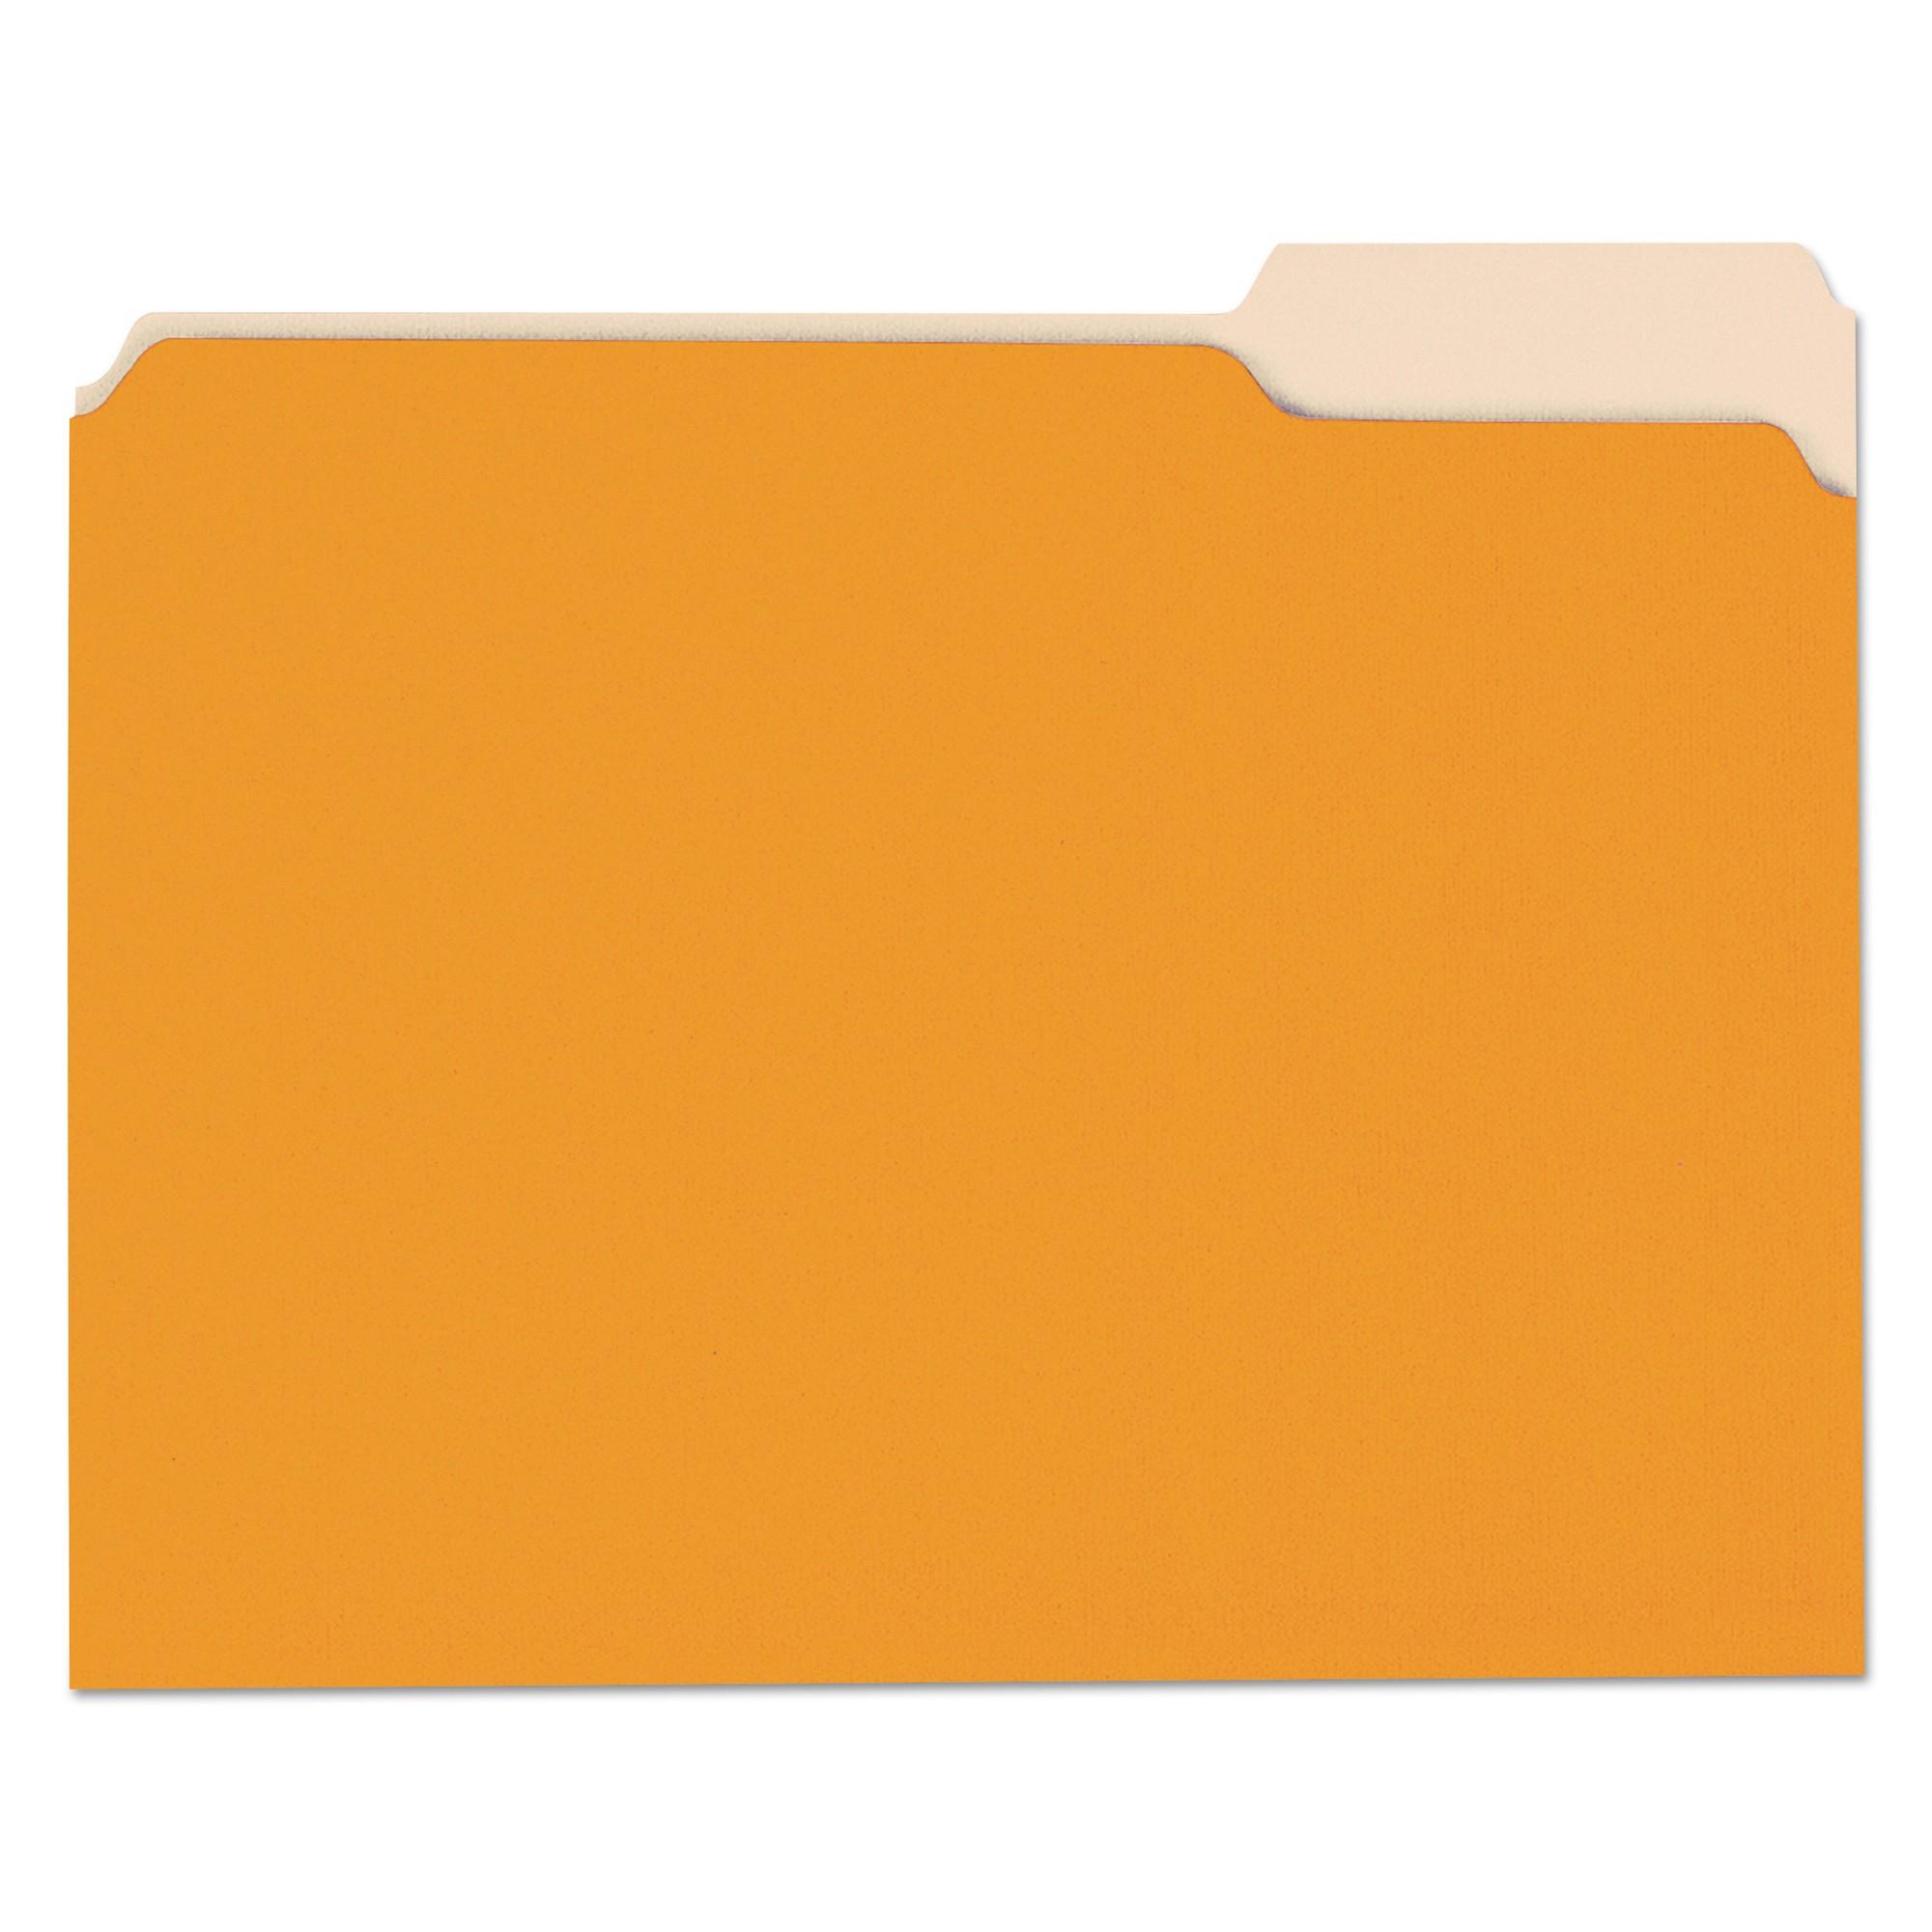 File Folders, 1/3 Cut One-Ply Top Tab, Letter, Orange/Light Orange, 100/Box